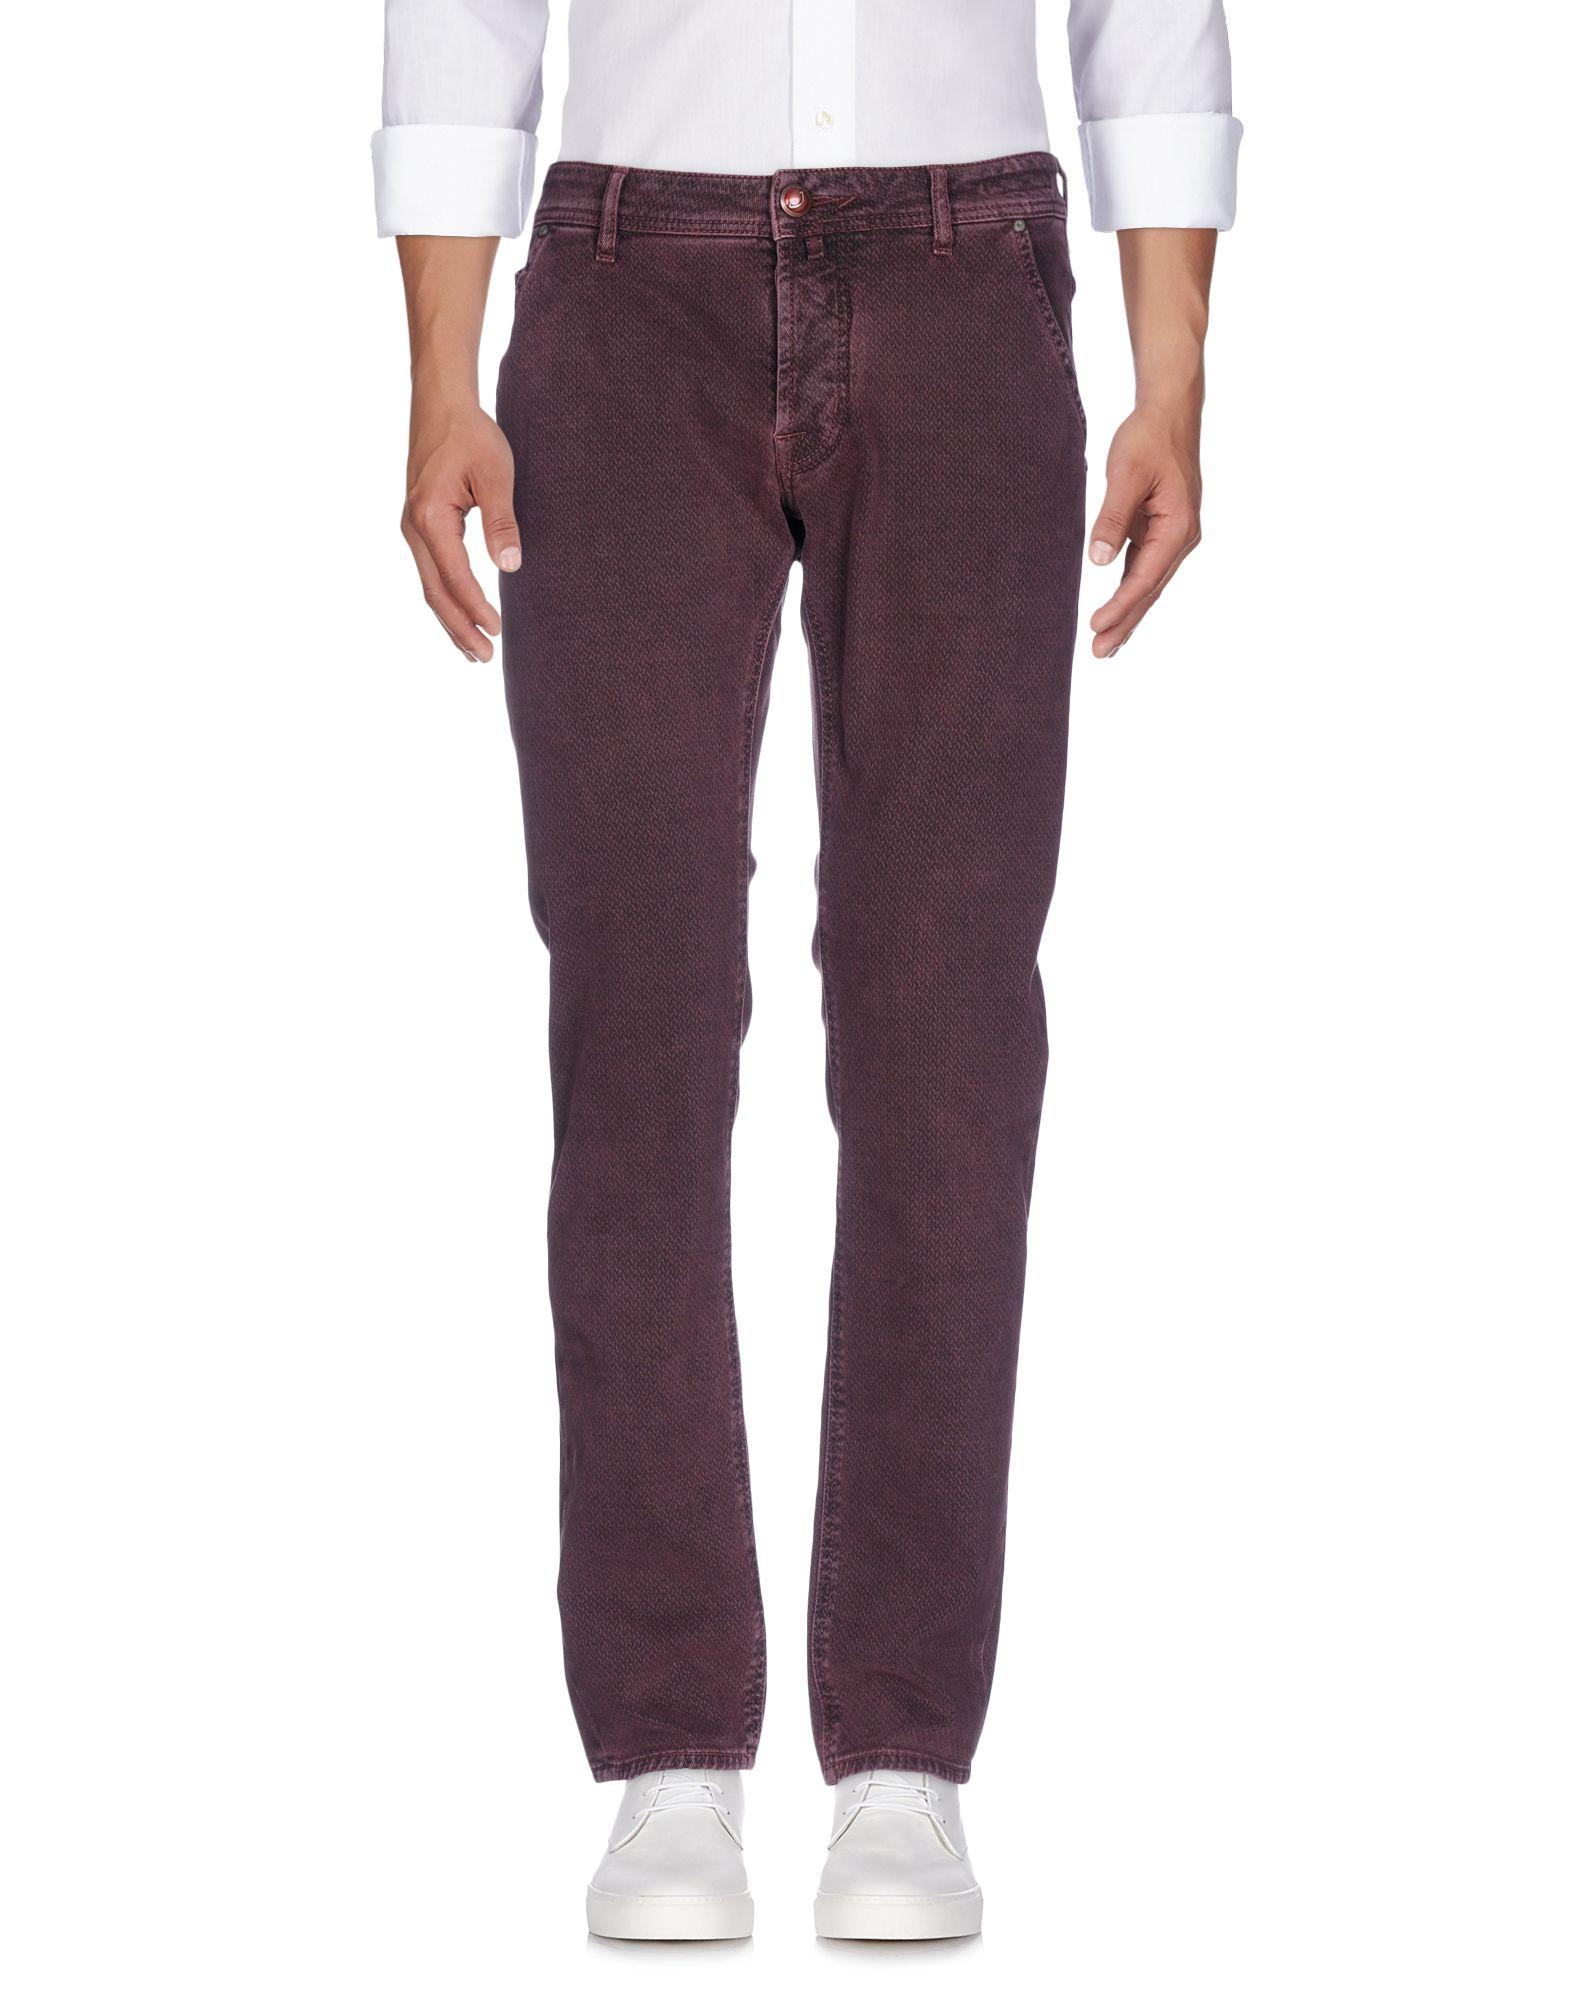 Pantaloni Jeans Jacob Cohёn Uomo - Acquista online su